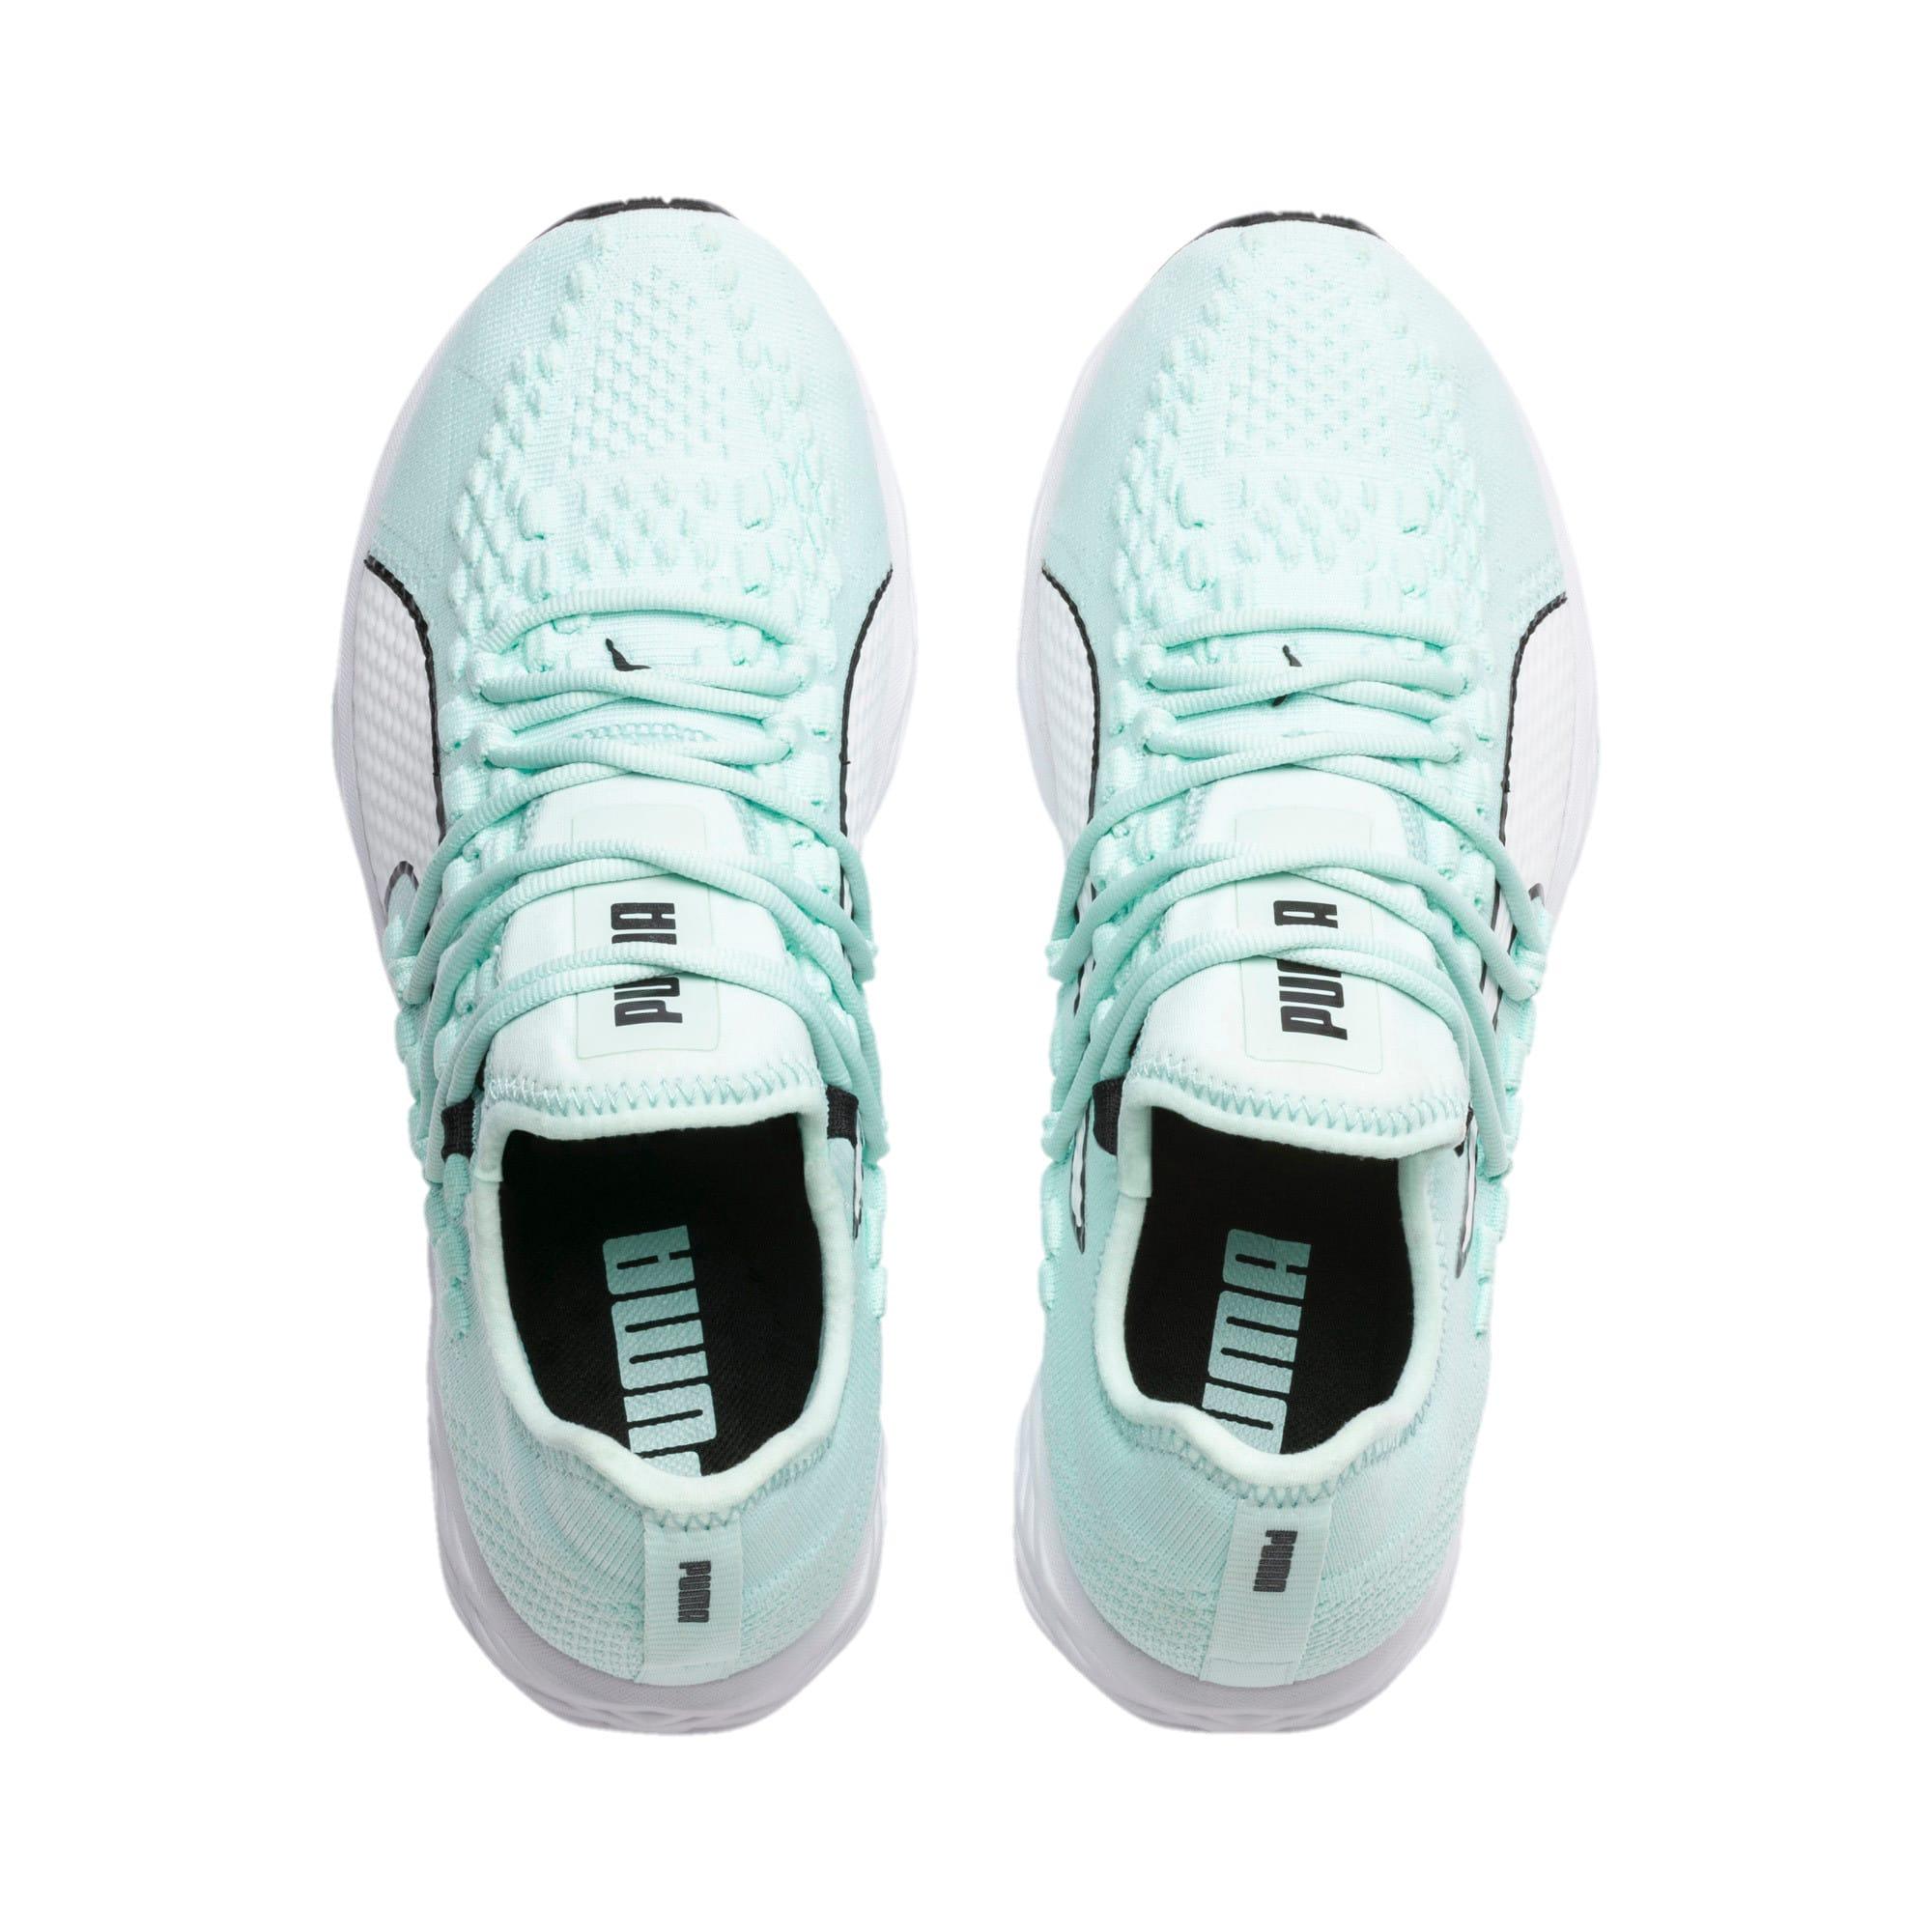 Thumbnail 6 of SPEED 300 RACER Women's Running Shoes, Fair Aqua-White-Black, medium